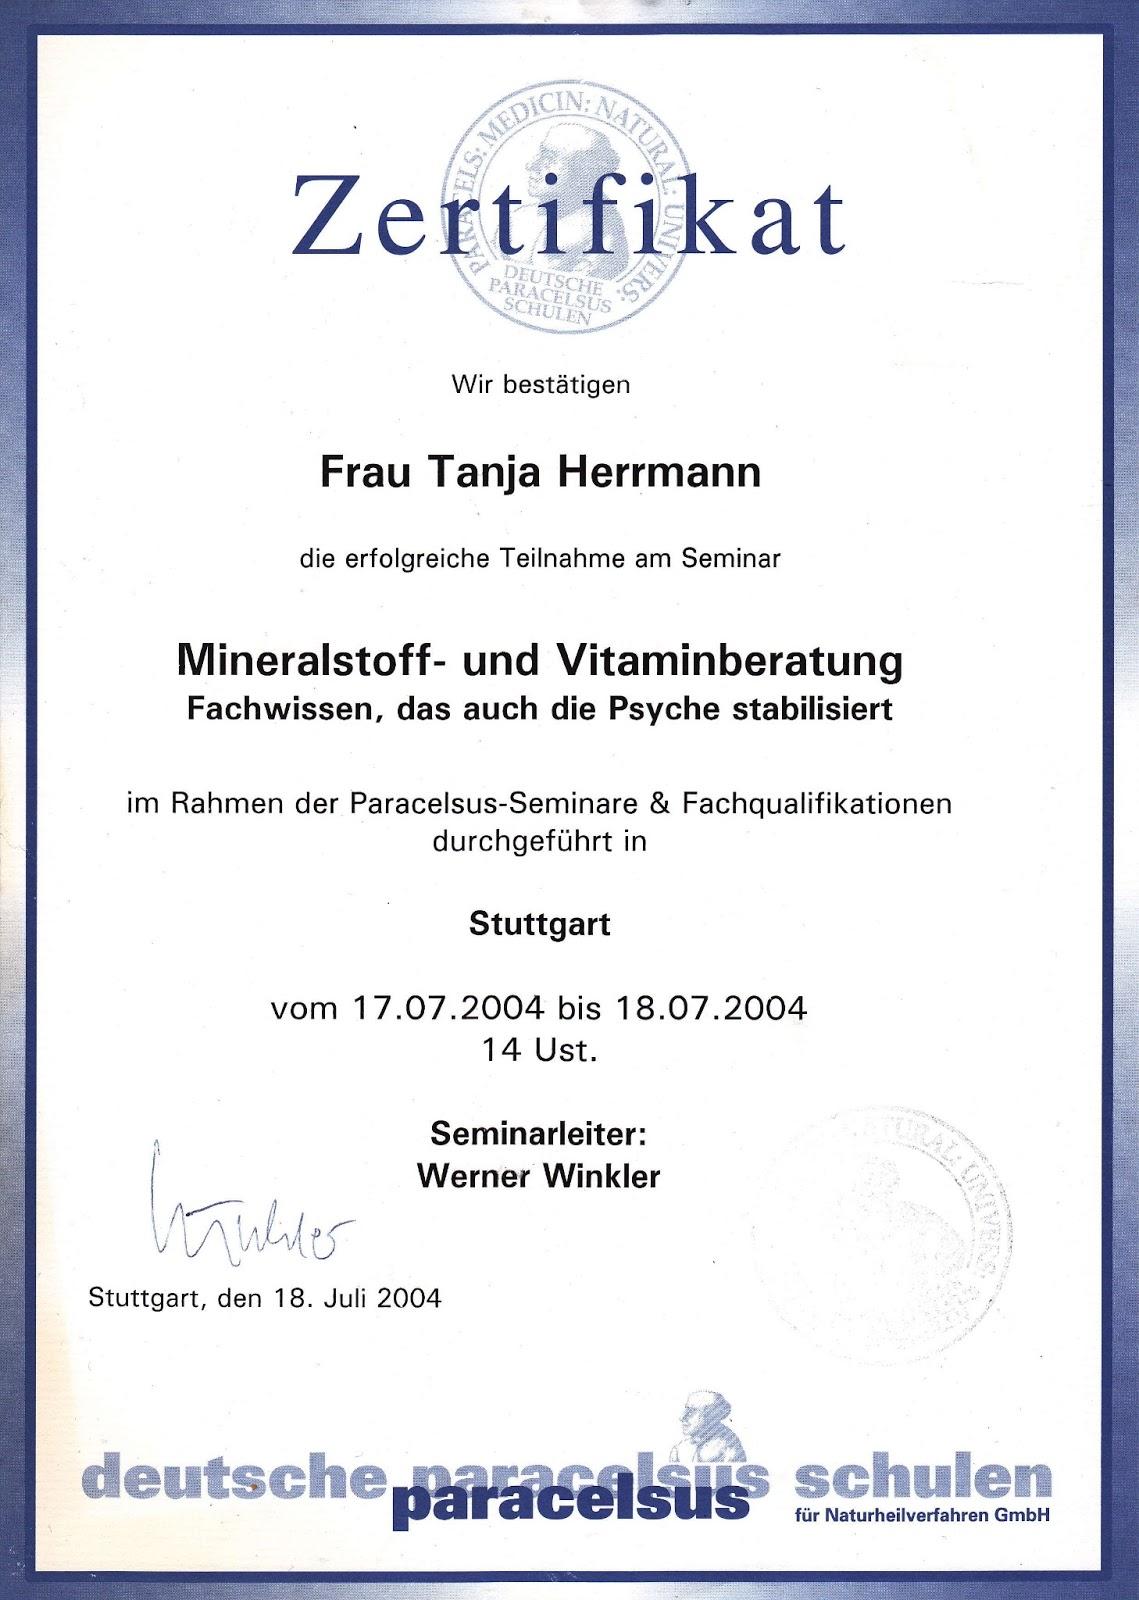 Großzügig Spaß Zertifikat Vorlagen Galerie - Entry Level Resume ...